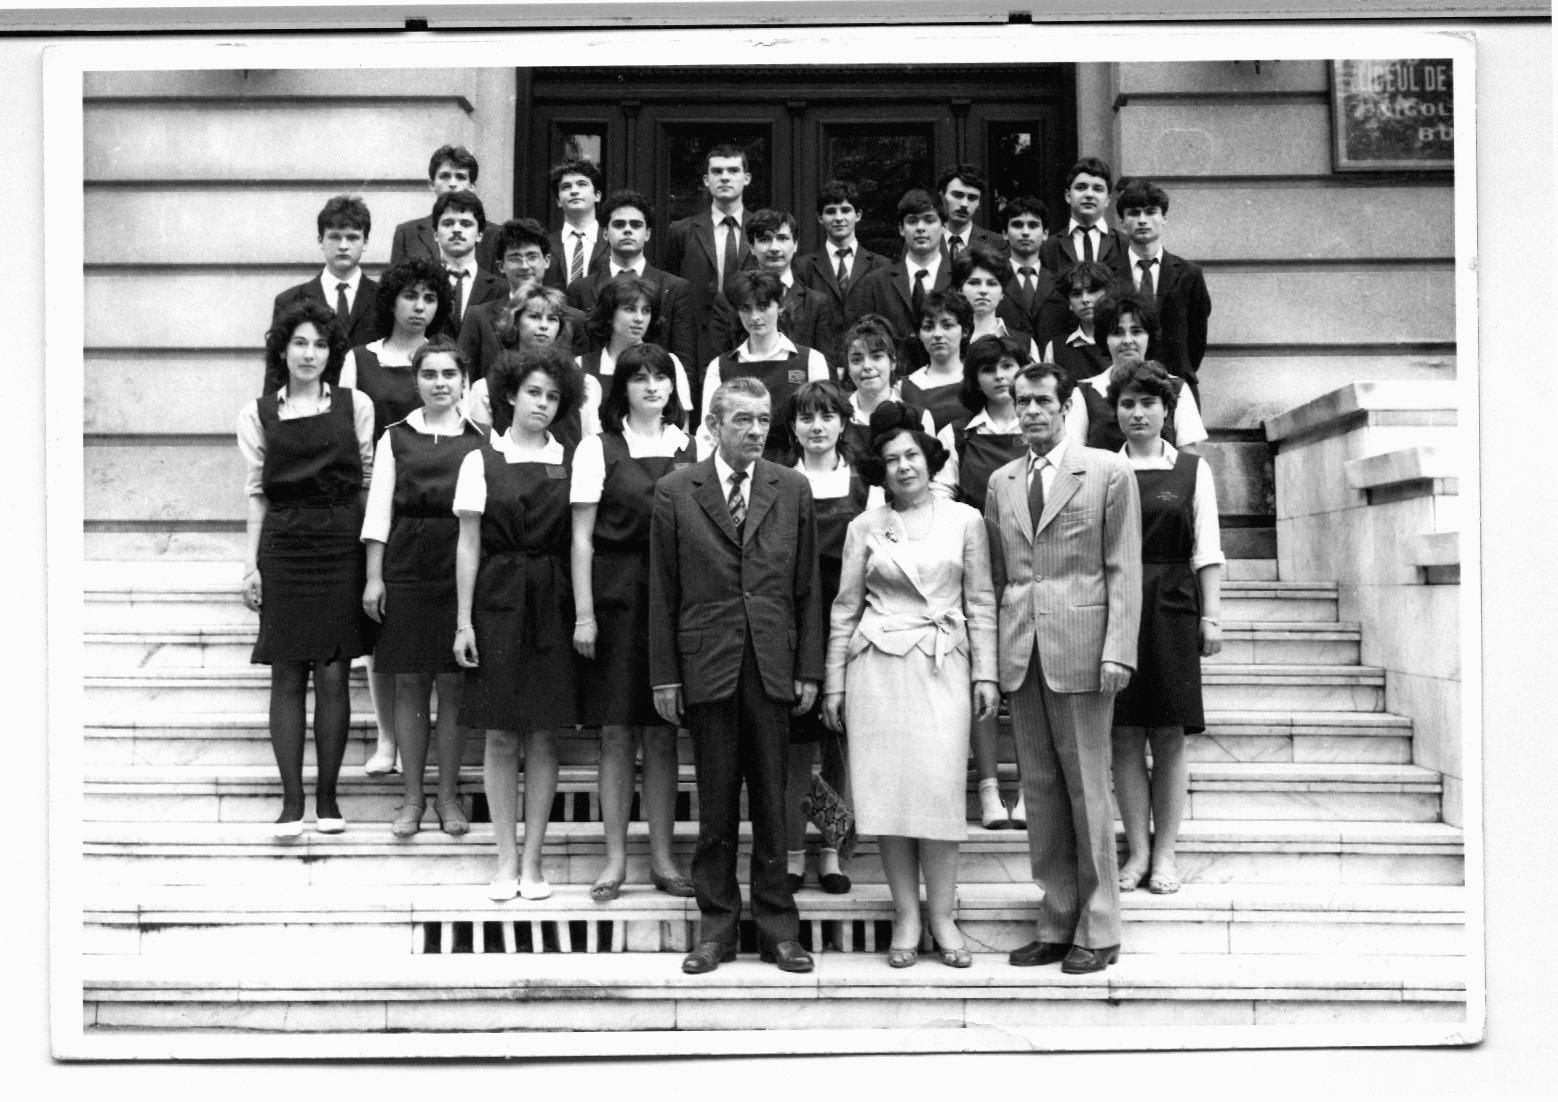 Clasa 12 V Colegiul National Sf Sava promotia 1986